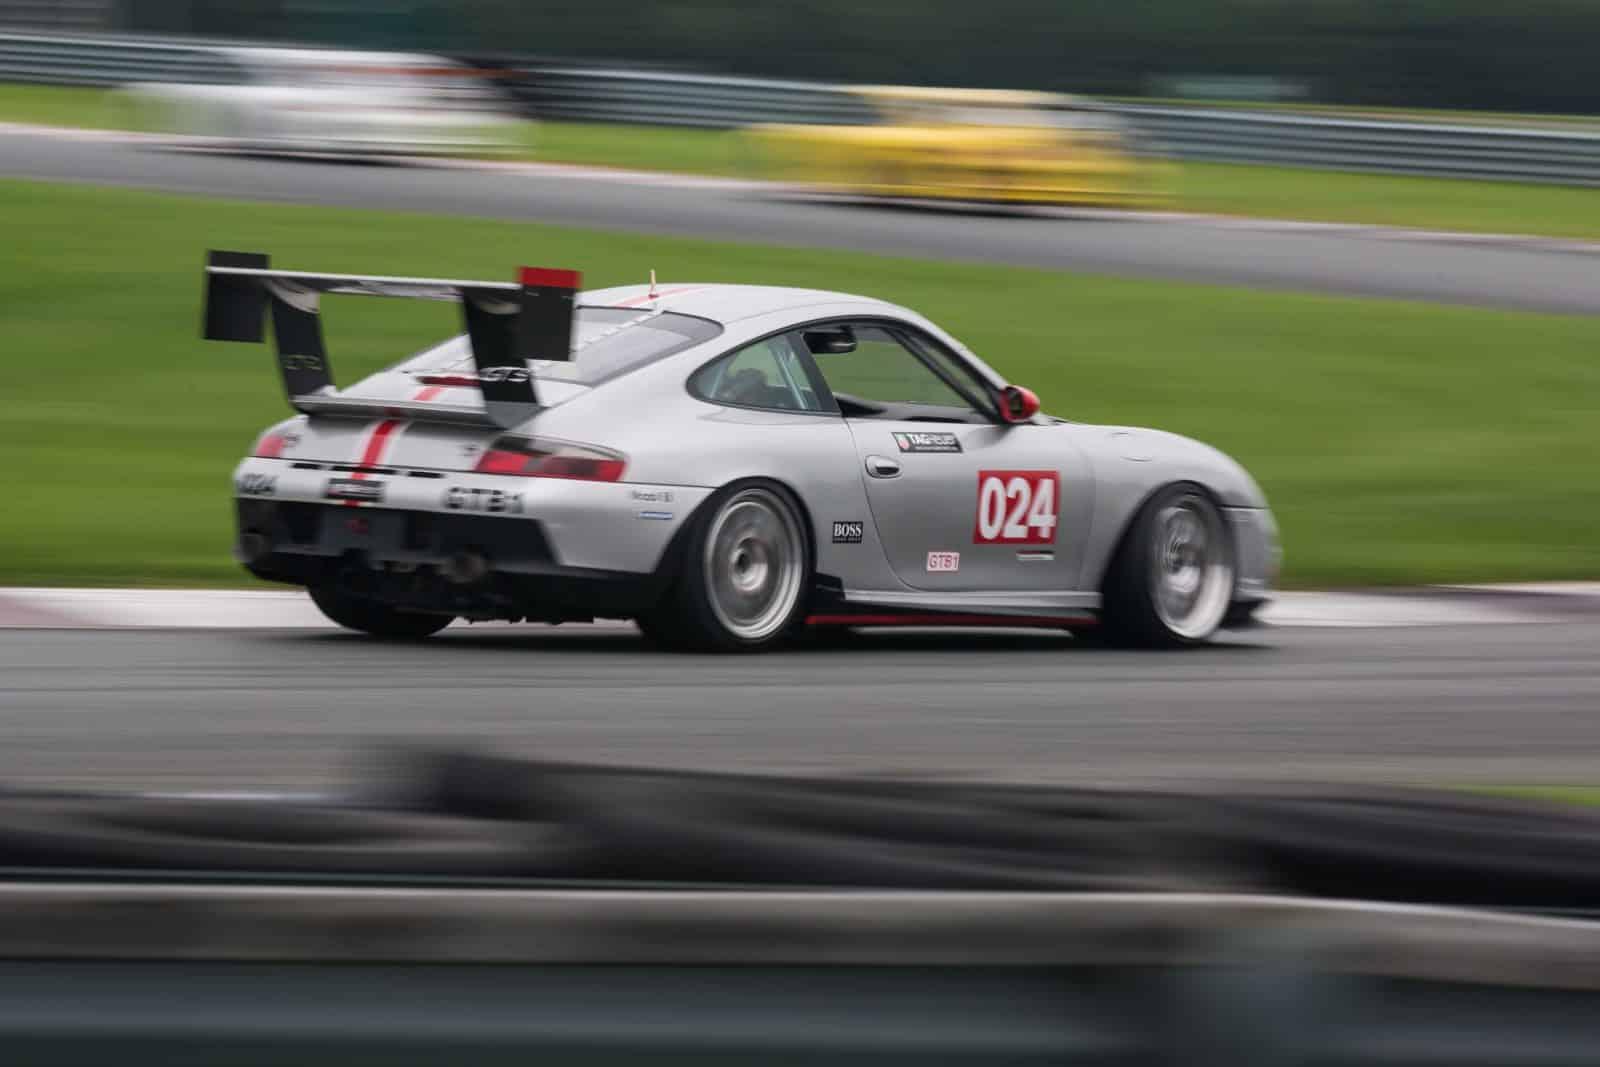 Porsche on track at NJMP